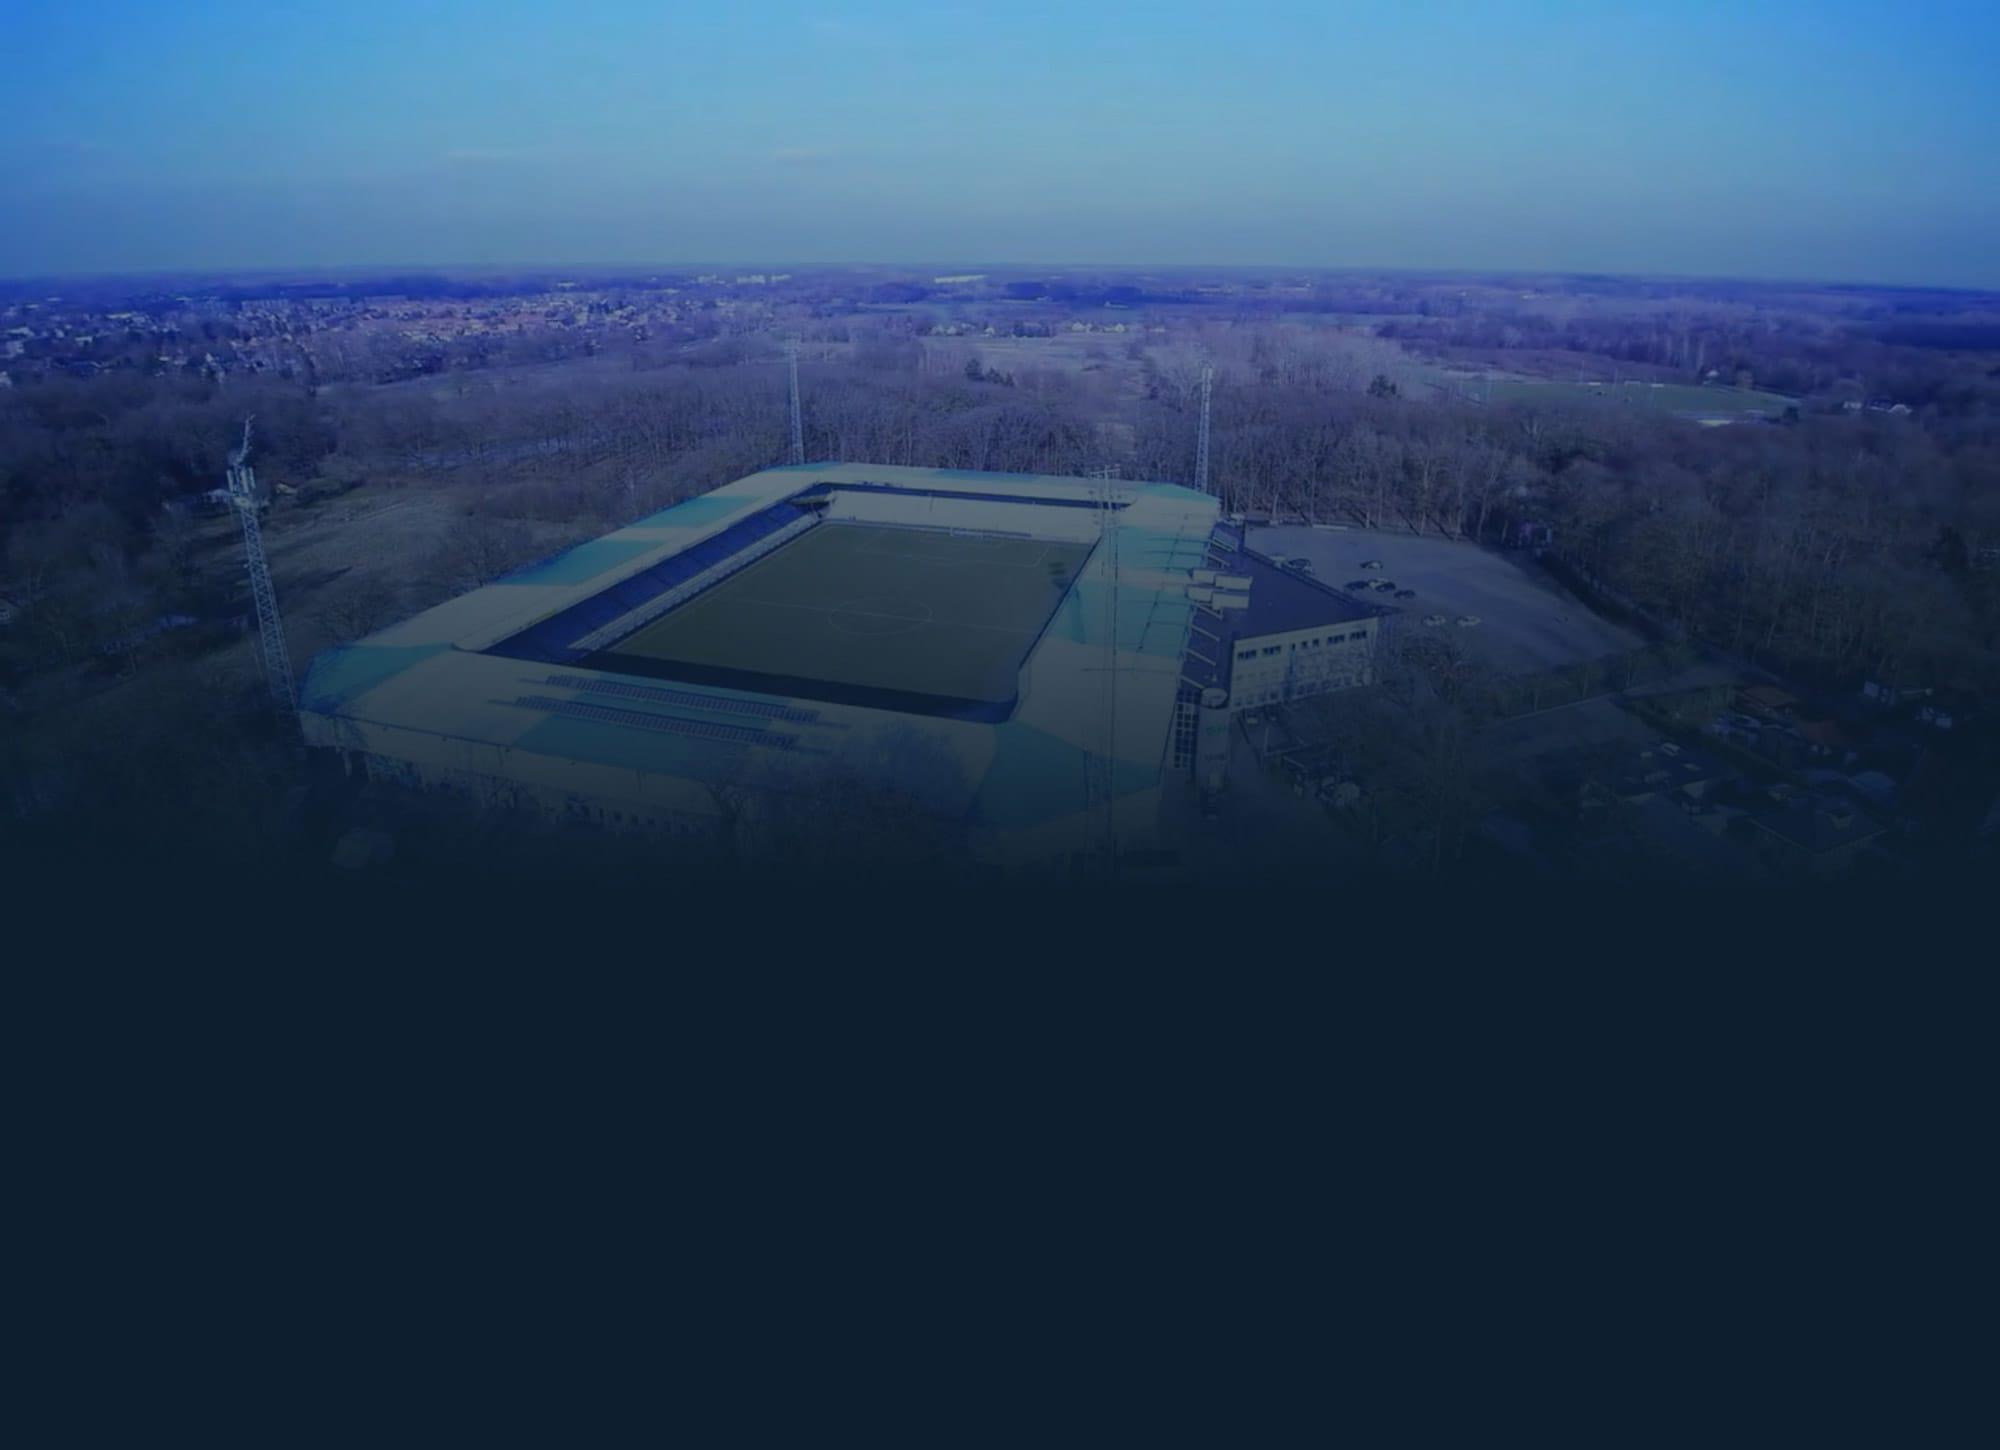 stadion afbeelding